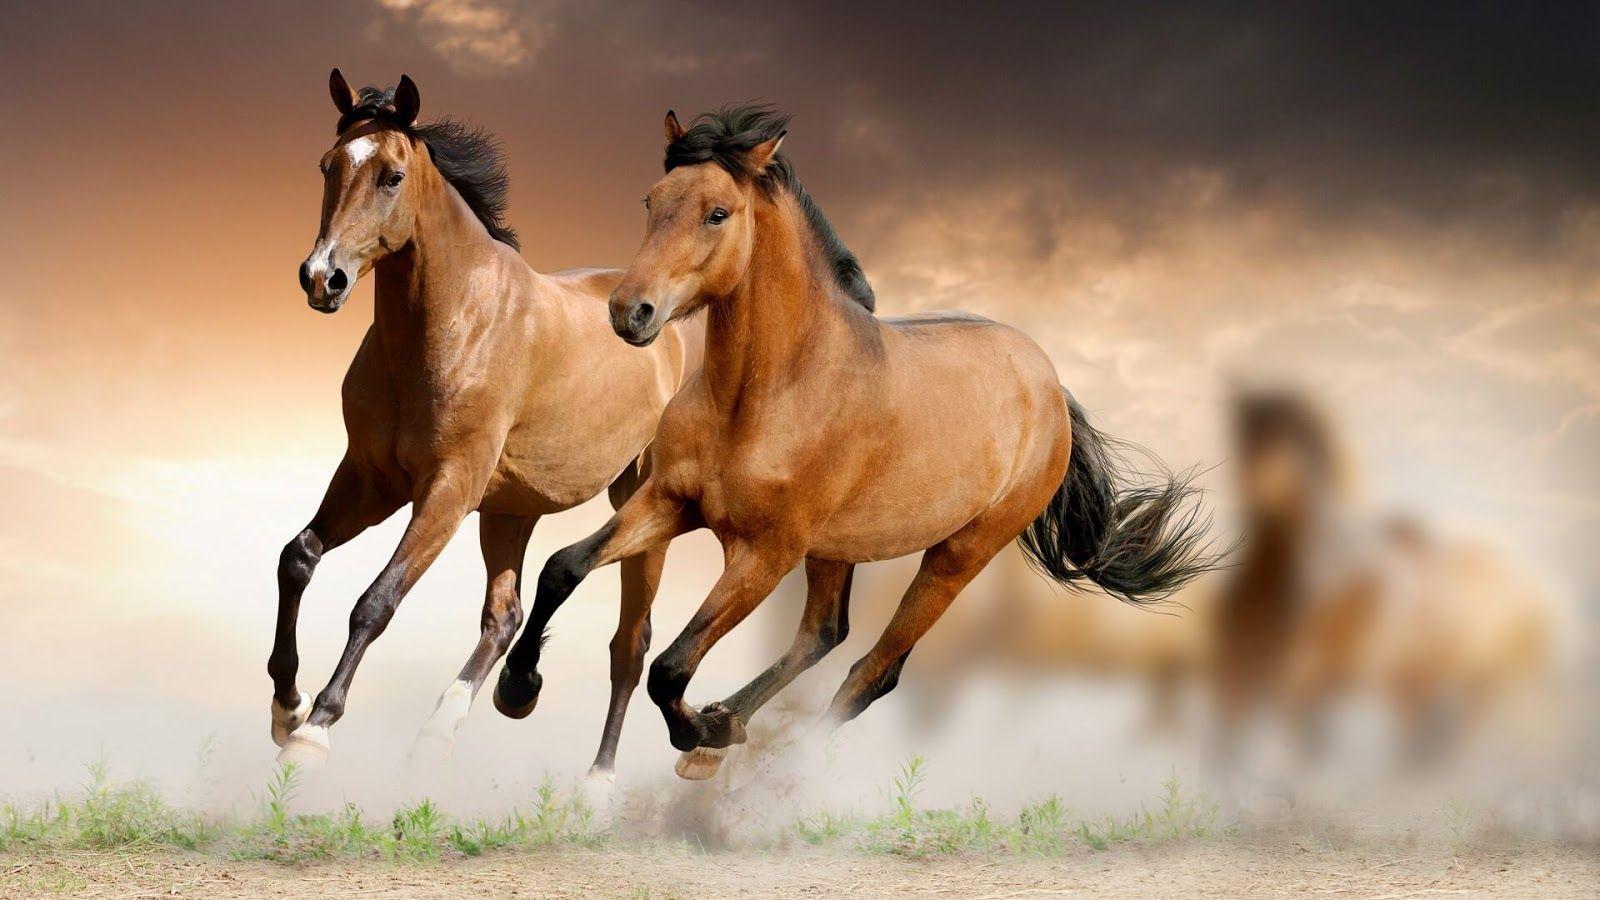 Horse Hd Wallpapers 1920x1080 Jpg 1600 900 Horse Wallpaper Images, Photos, Reviews